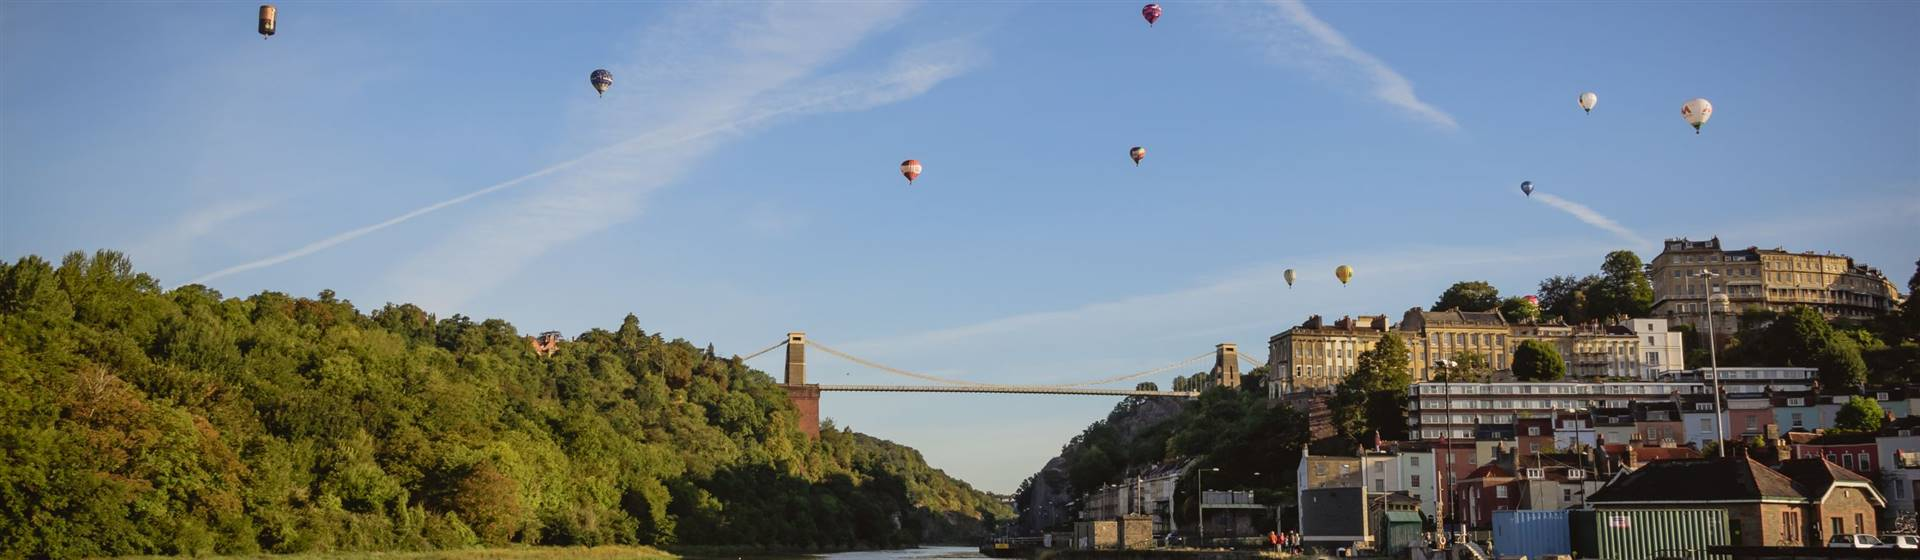 "<img src=""liftonsuspensionbridge-shutterstocklr.jpeg"" alt=""Clifton Suspension Bridge""/>"